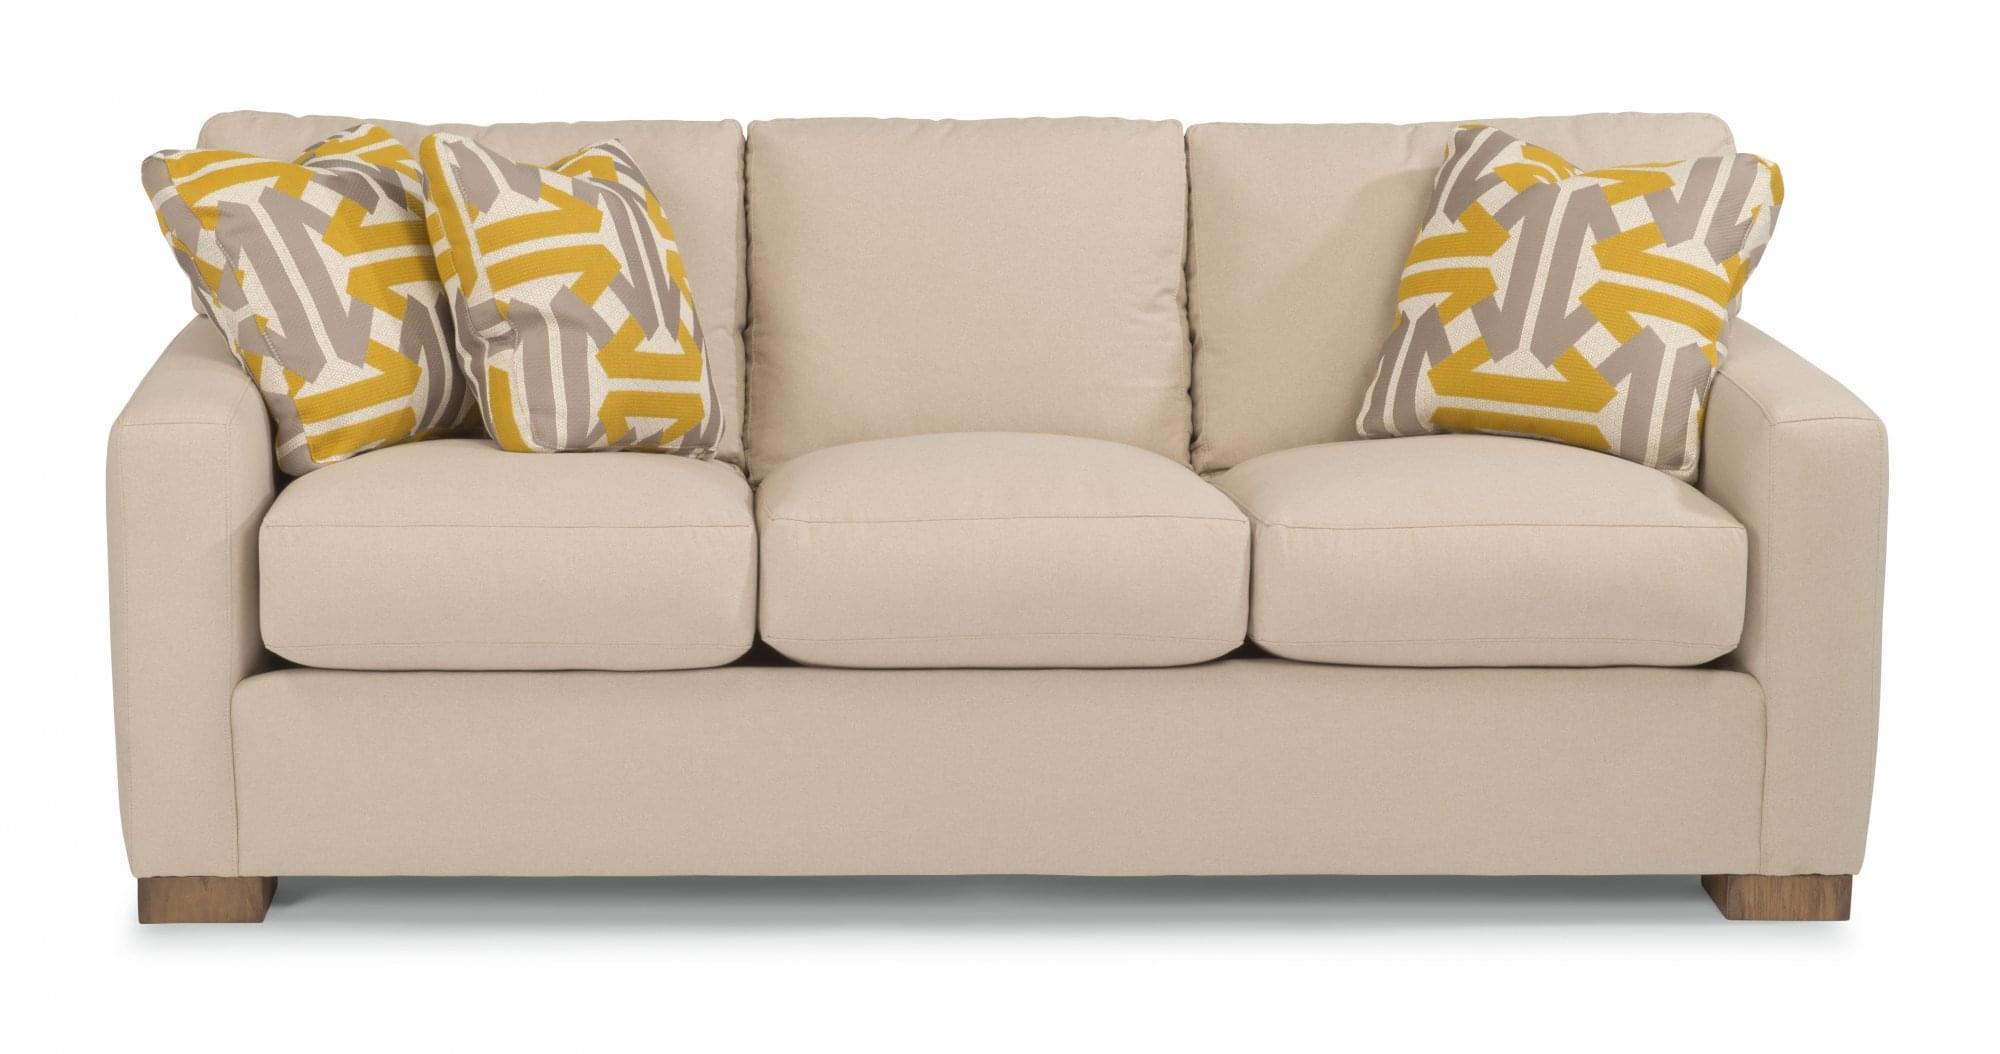 Flexsteel Living Room Furniture Bryant Sofa